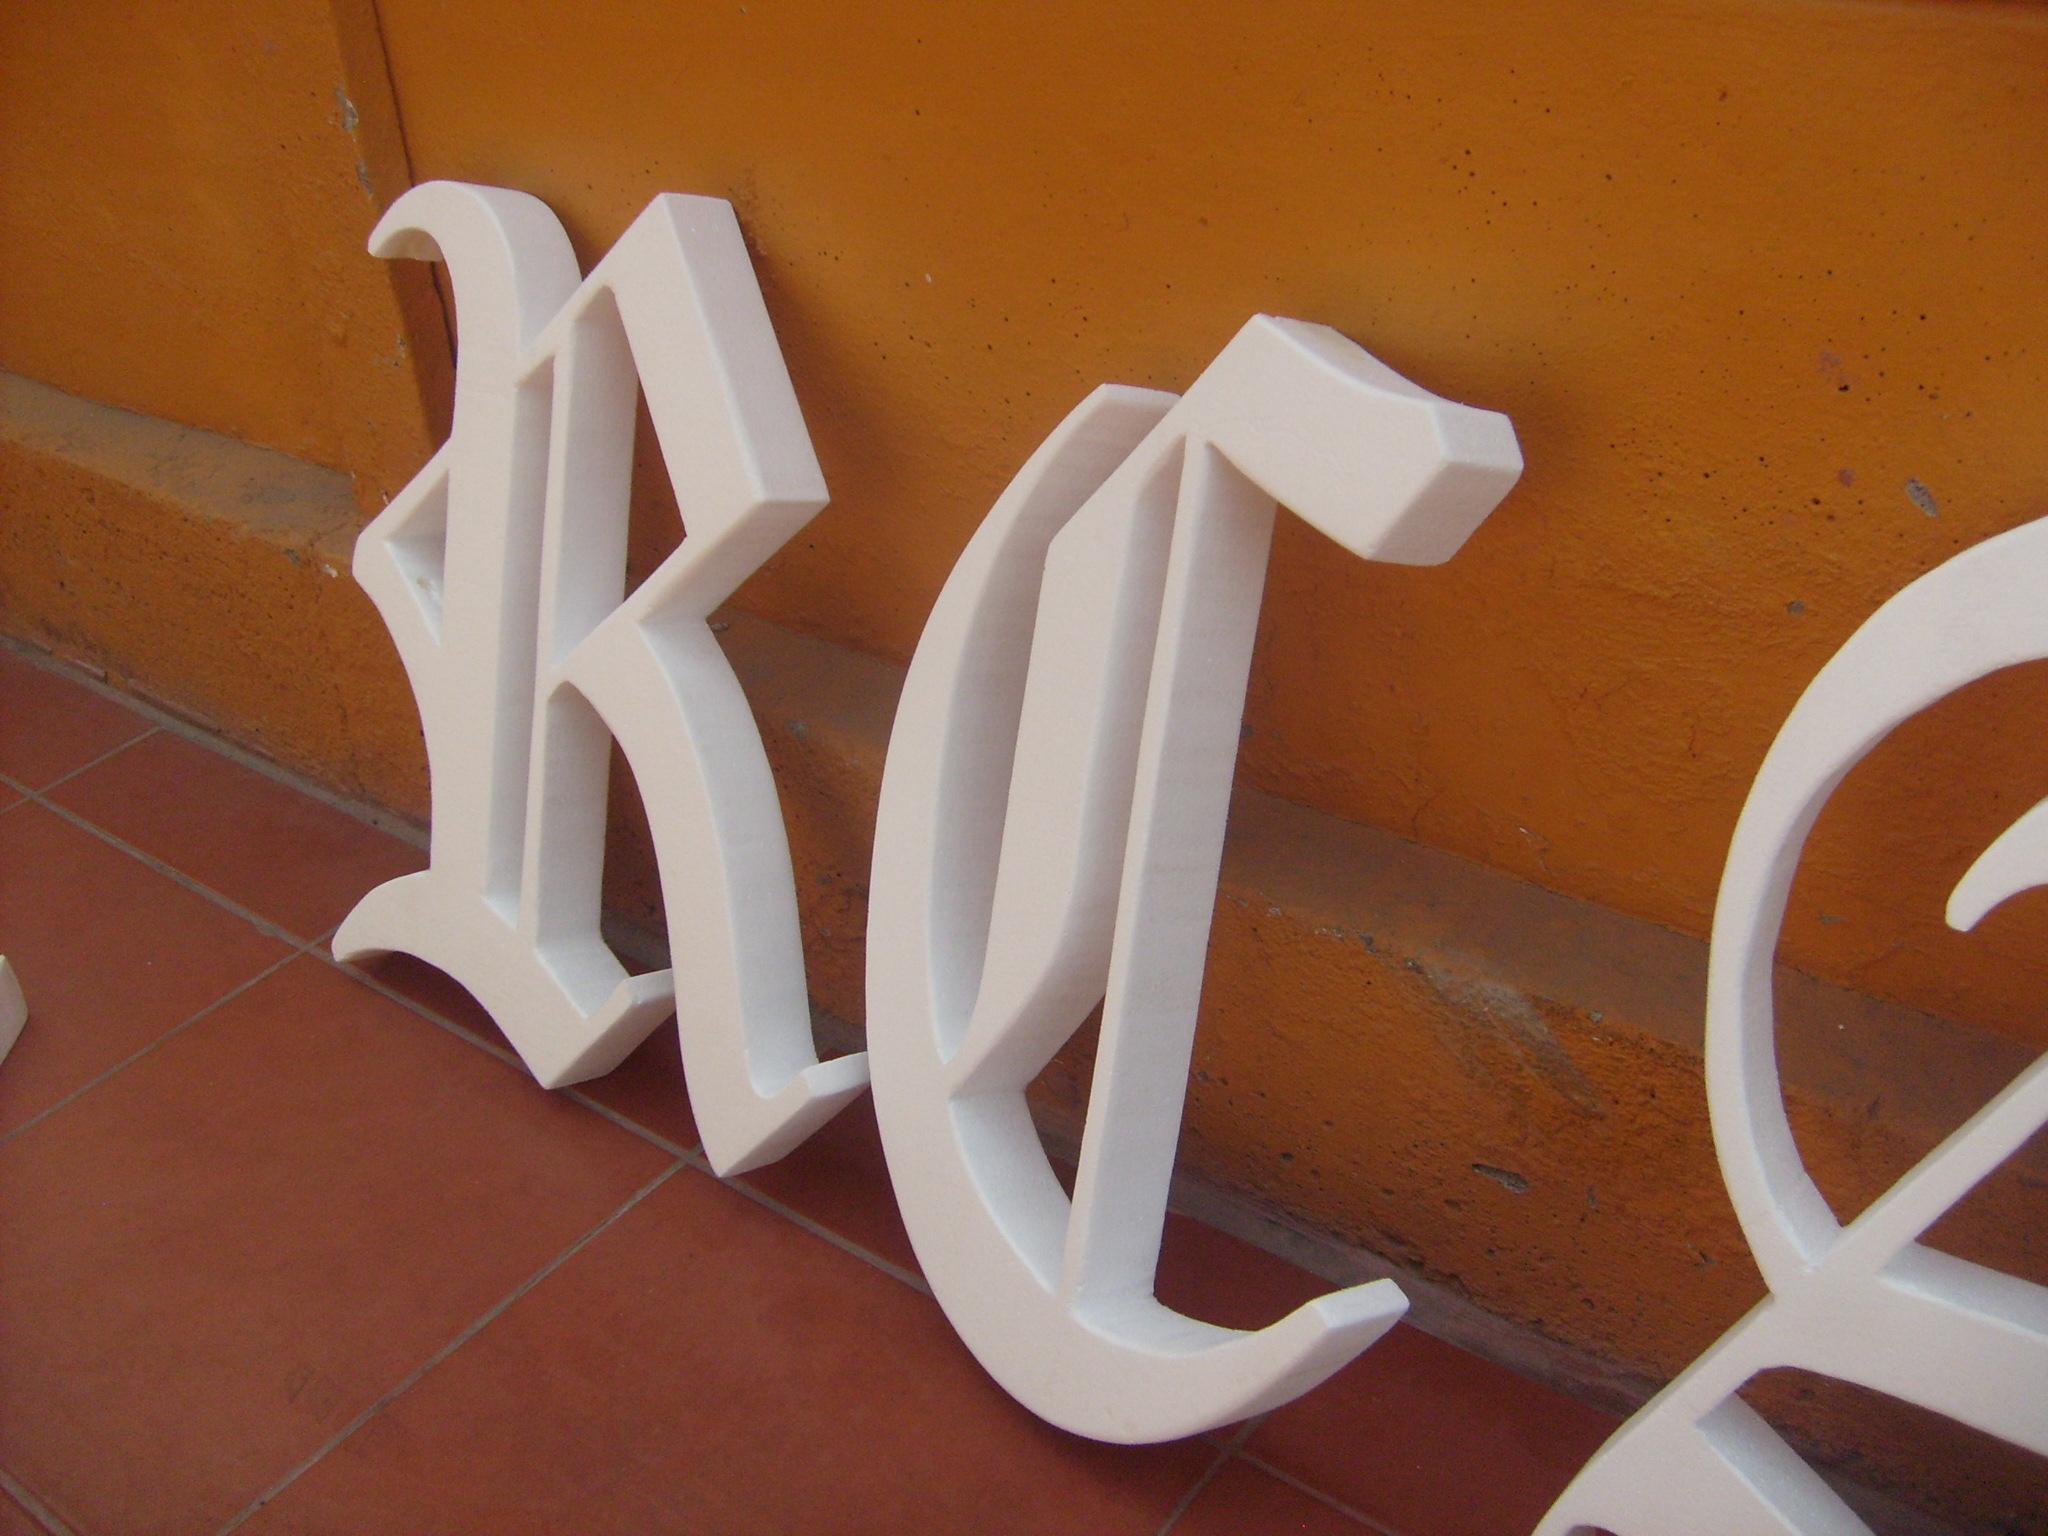 Letras Corte CNC Nicrom